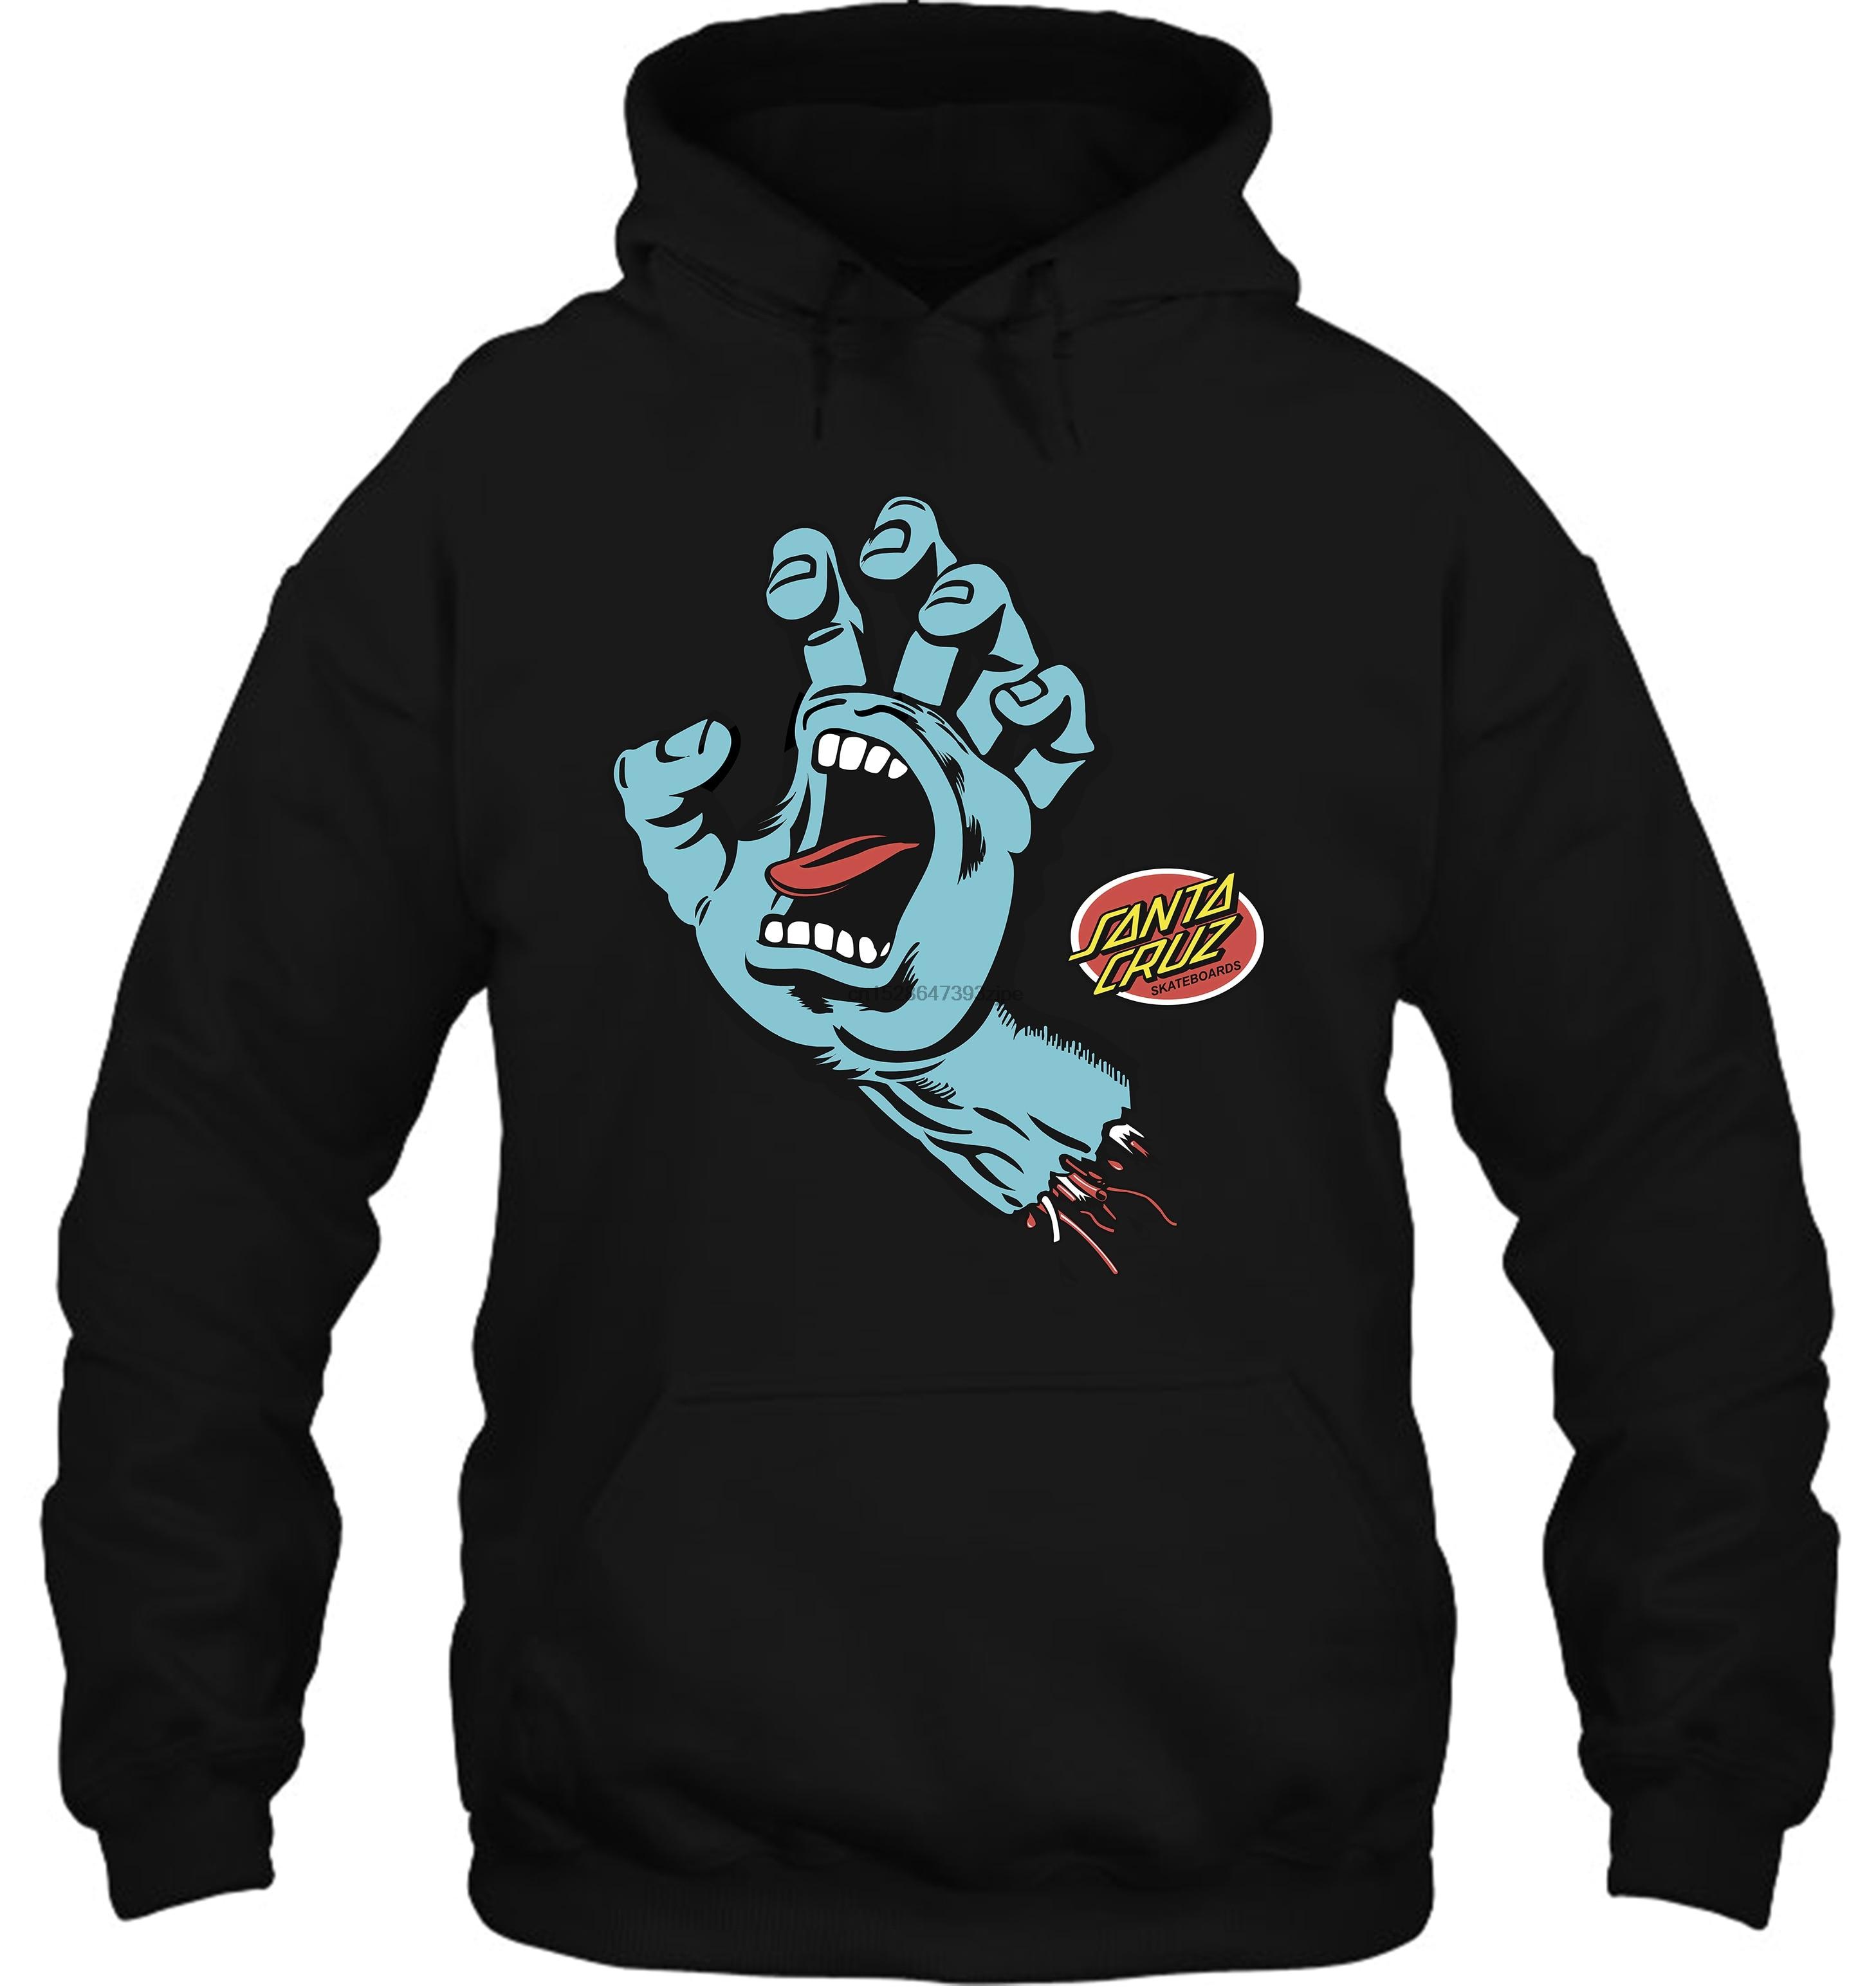 Vintage Skate 1980s Hand Logo Retro Skateboarding Reprint Streetwear Men Women Hoodies Sweatshirts